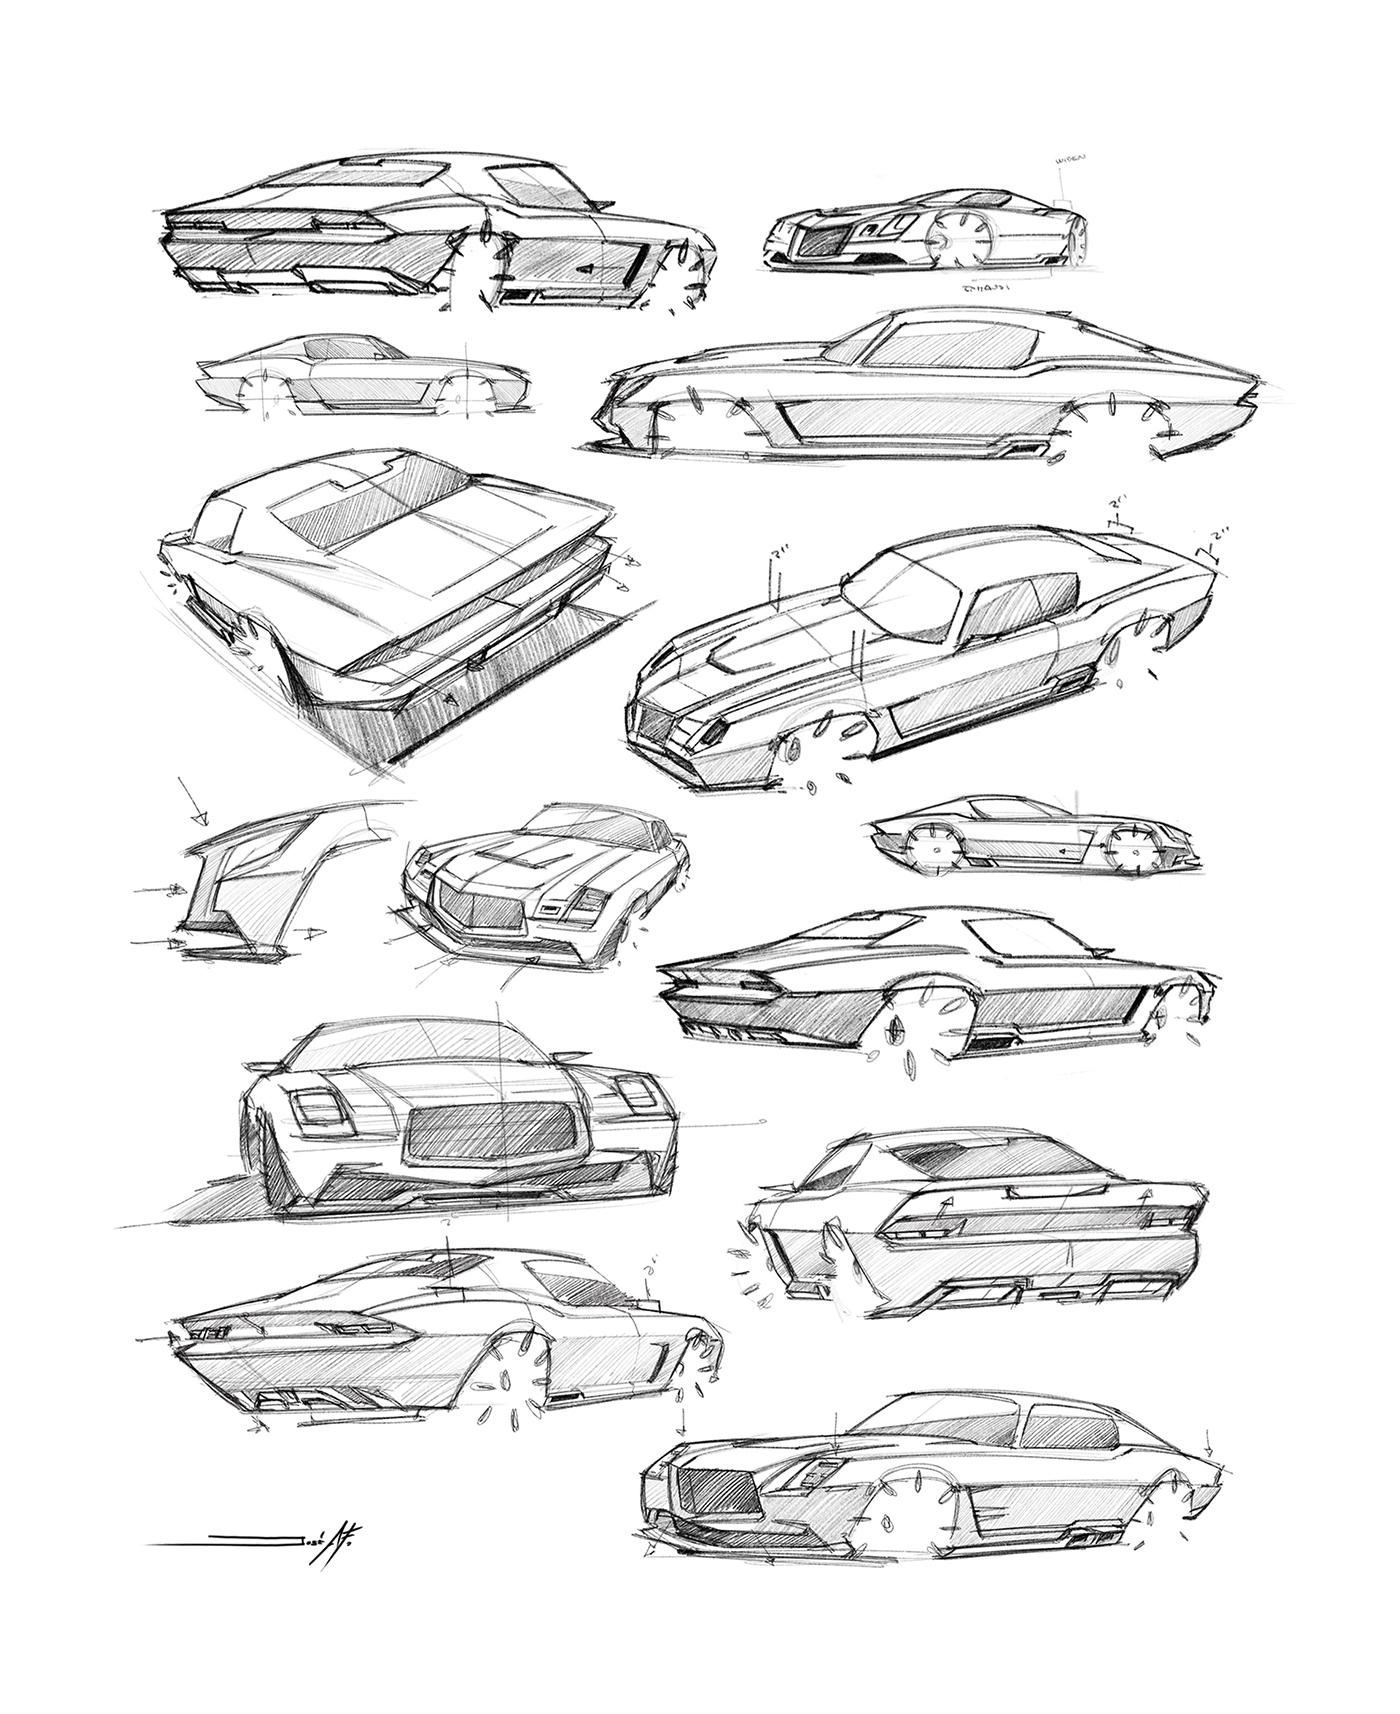 car,camaro,Retro,future,black,modern,sketch,chevrolet,animation ,tech